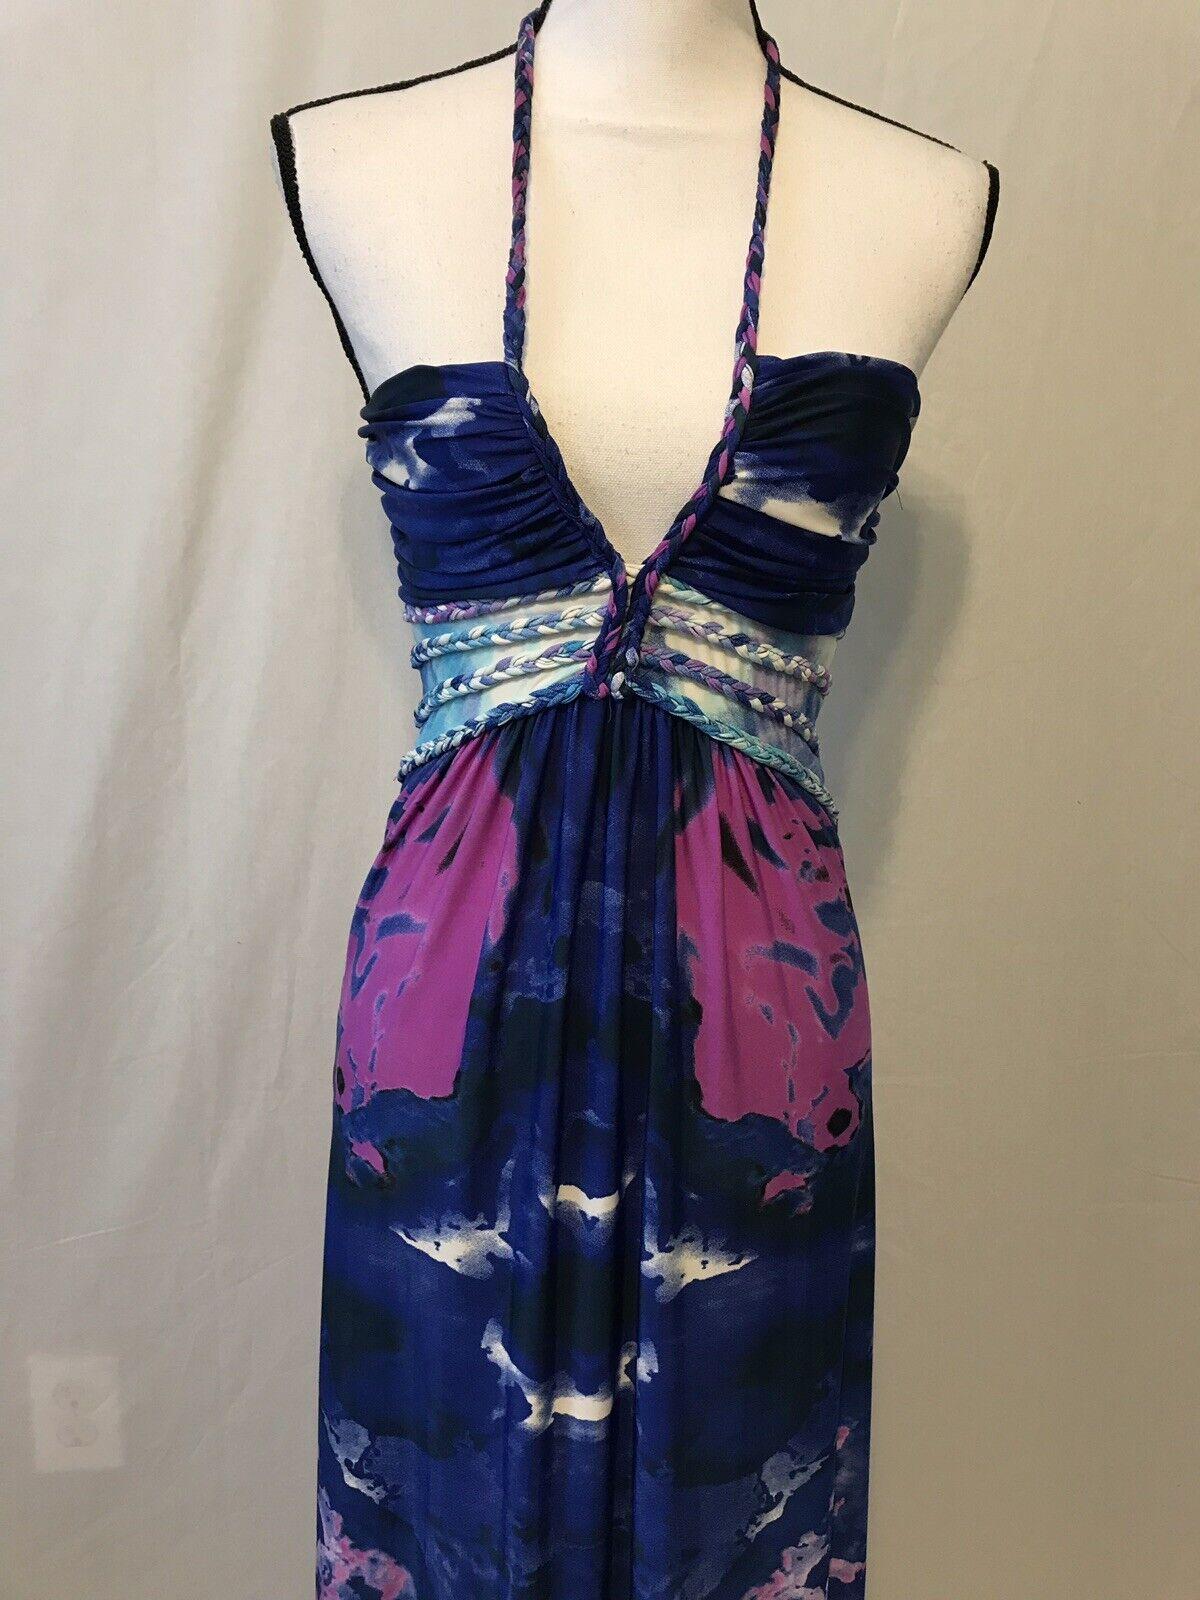 Cynthia Rowley WaterFarbe Resort Maxi Dress Gown SZ S